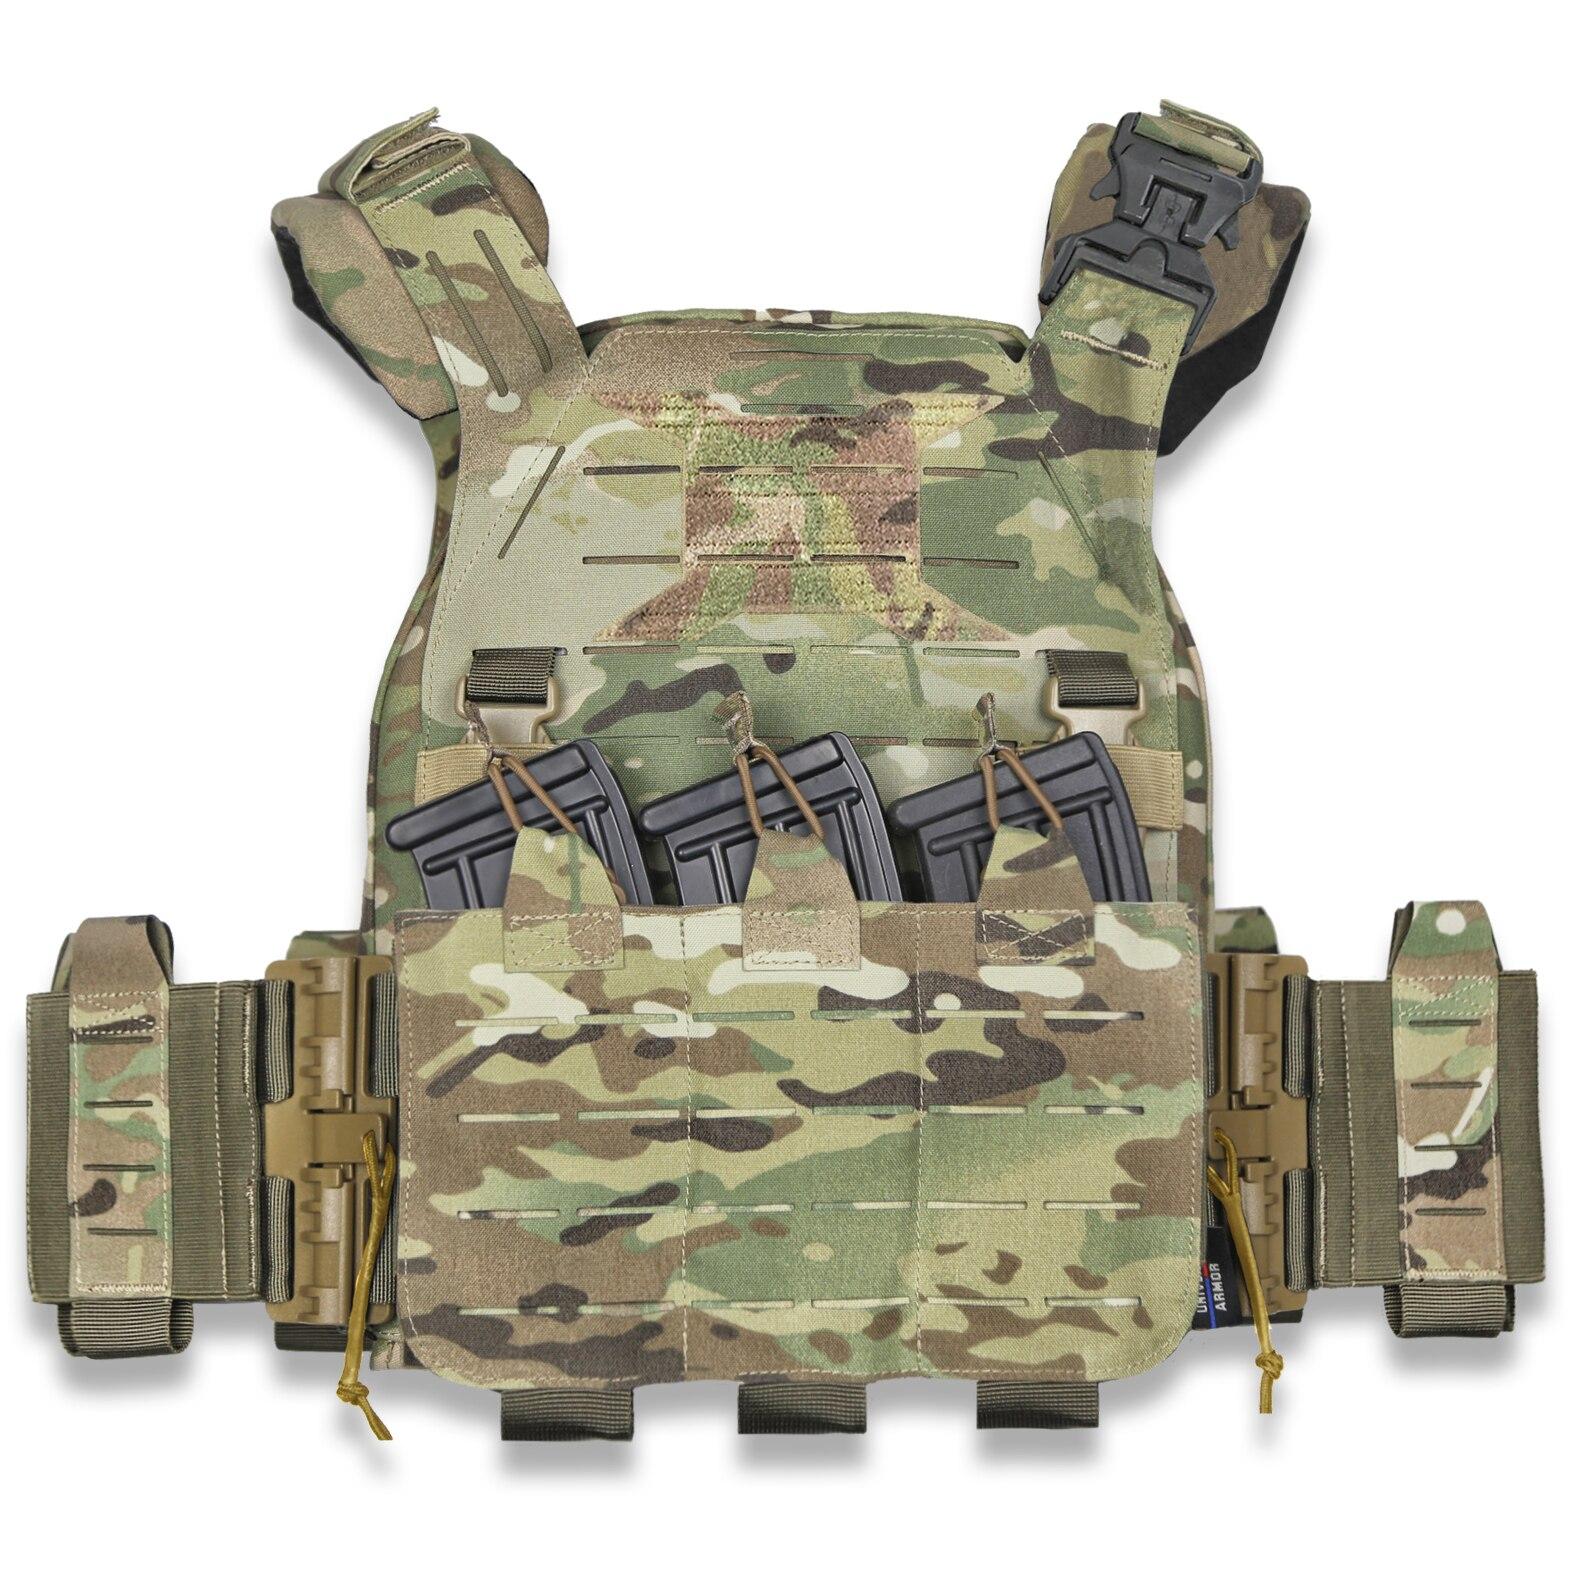 UTA X-Wildbee Universal Armoured Lightweight Tactical Plate Carrier Modular Hunting Vest